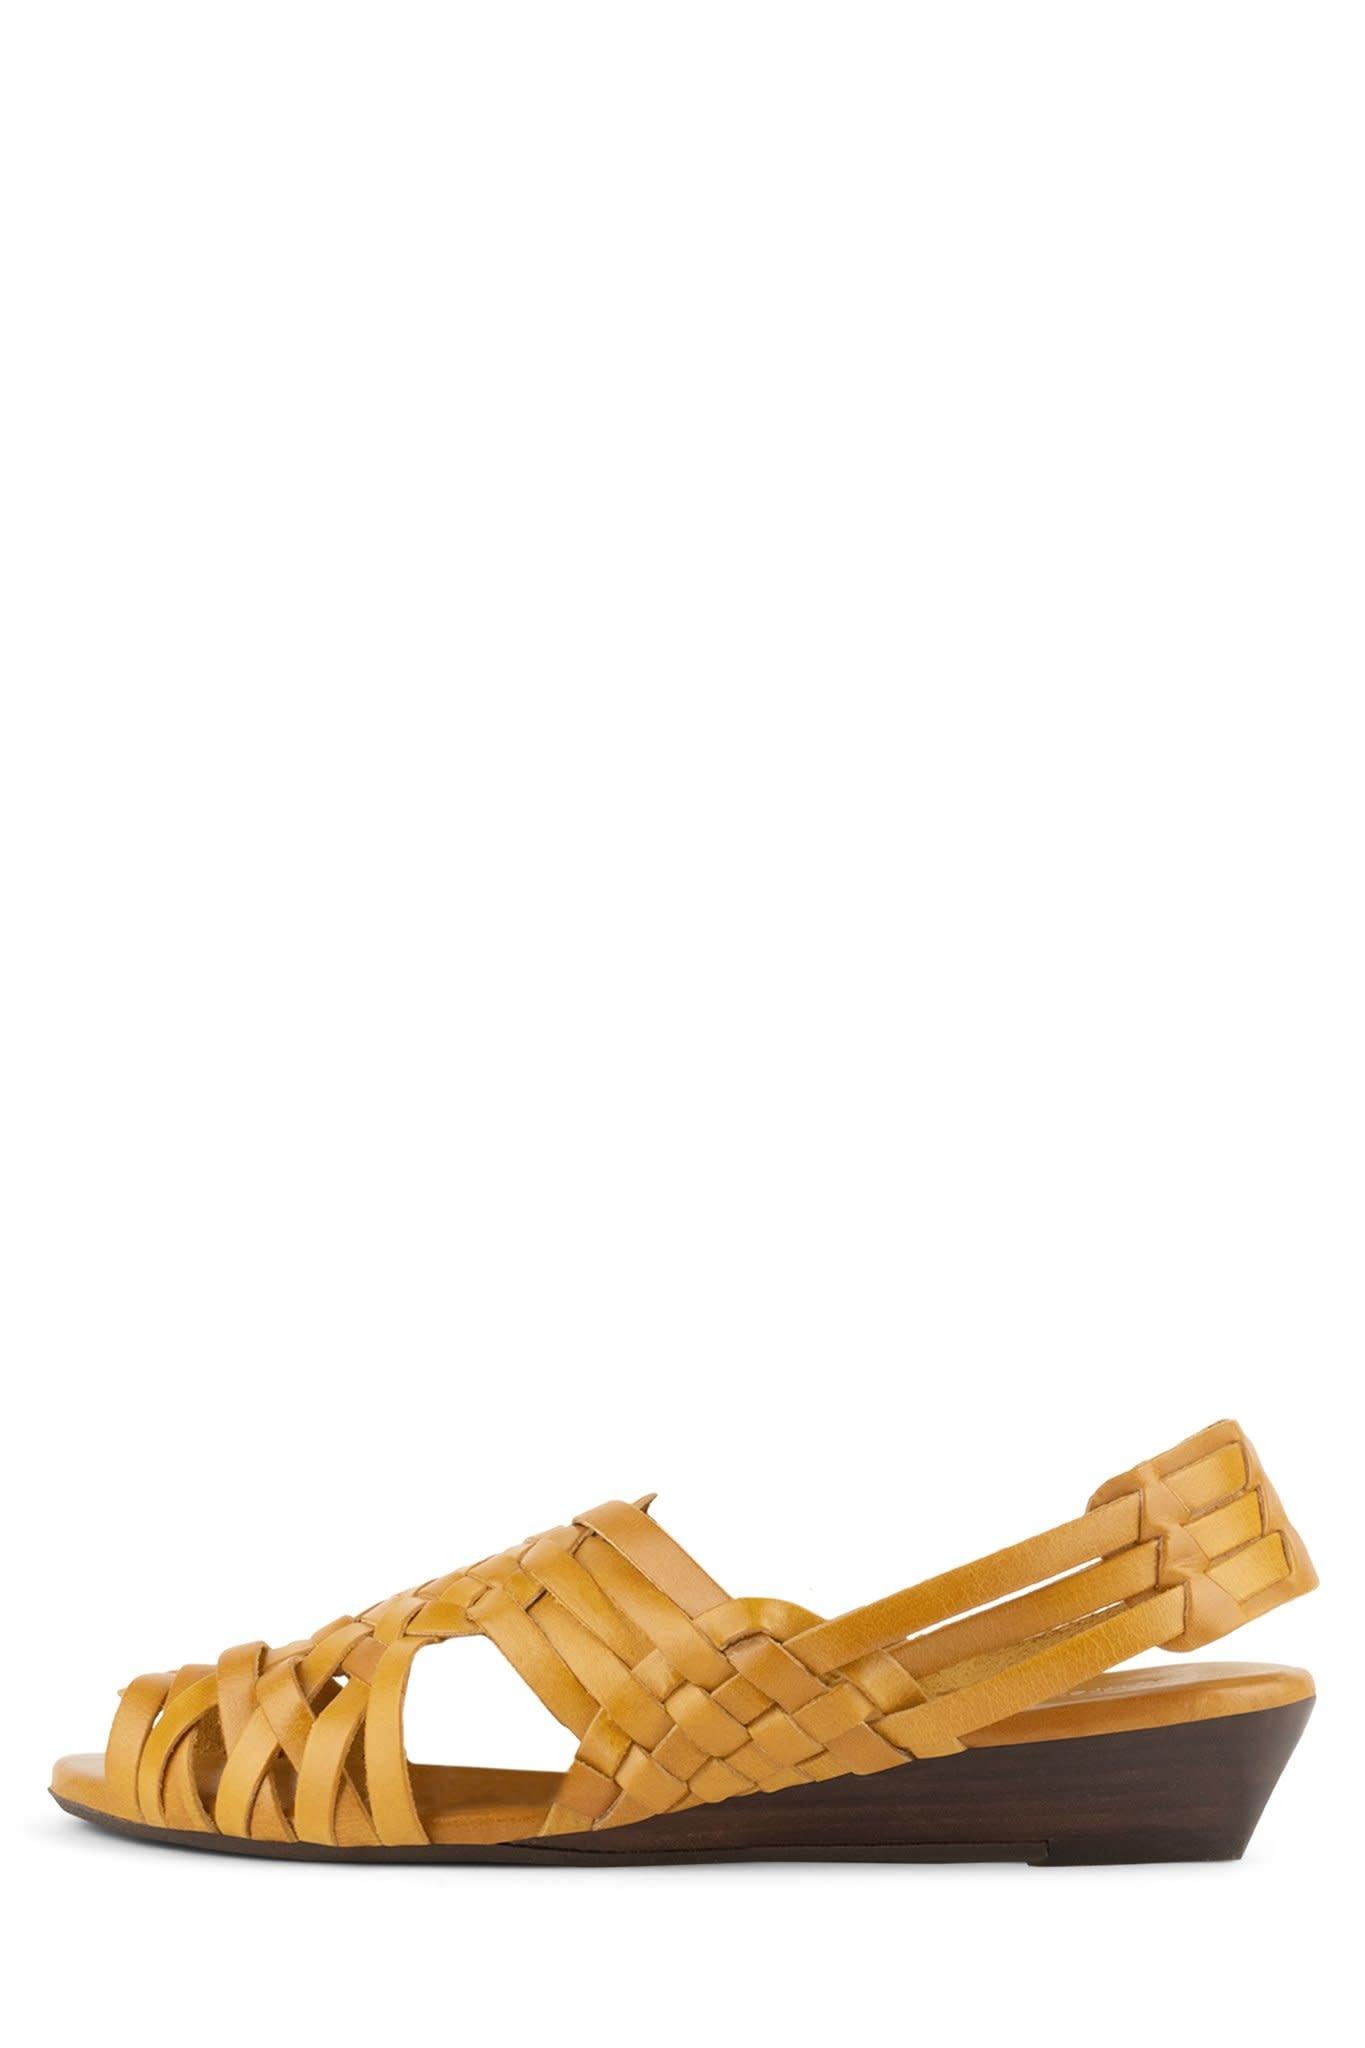 Jeffrey Campbell Celano Mustard Sandal